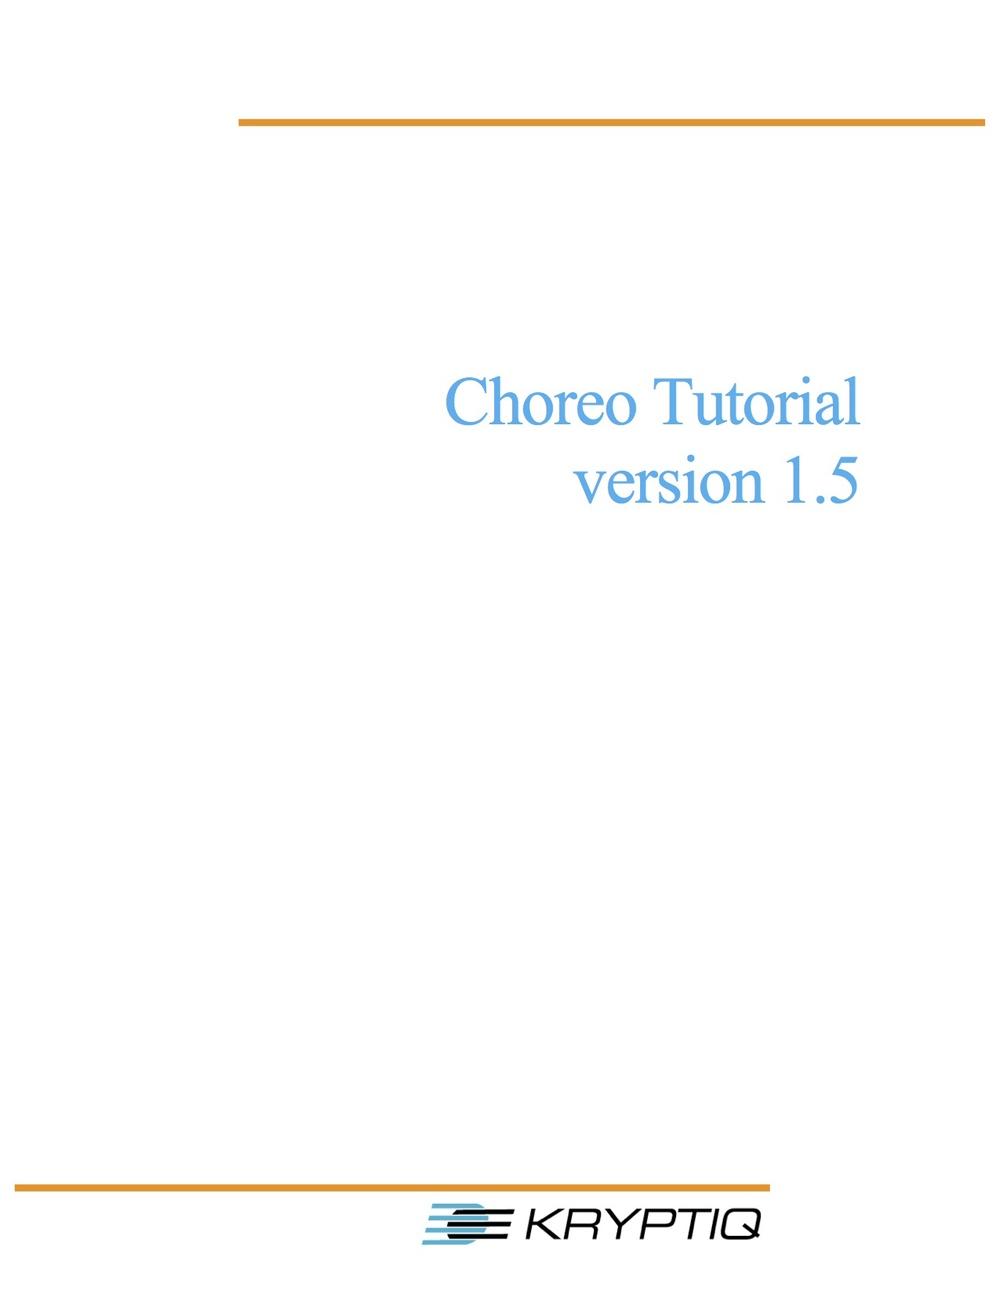 Choreo_Tutorial1.jpg